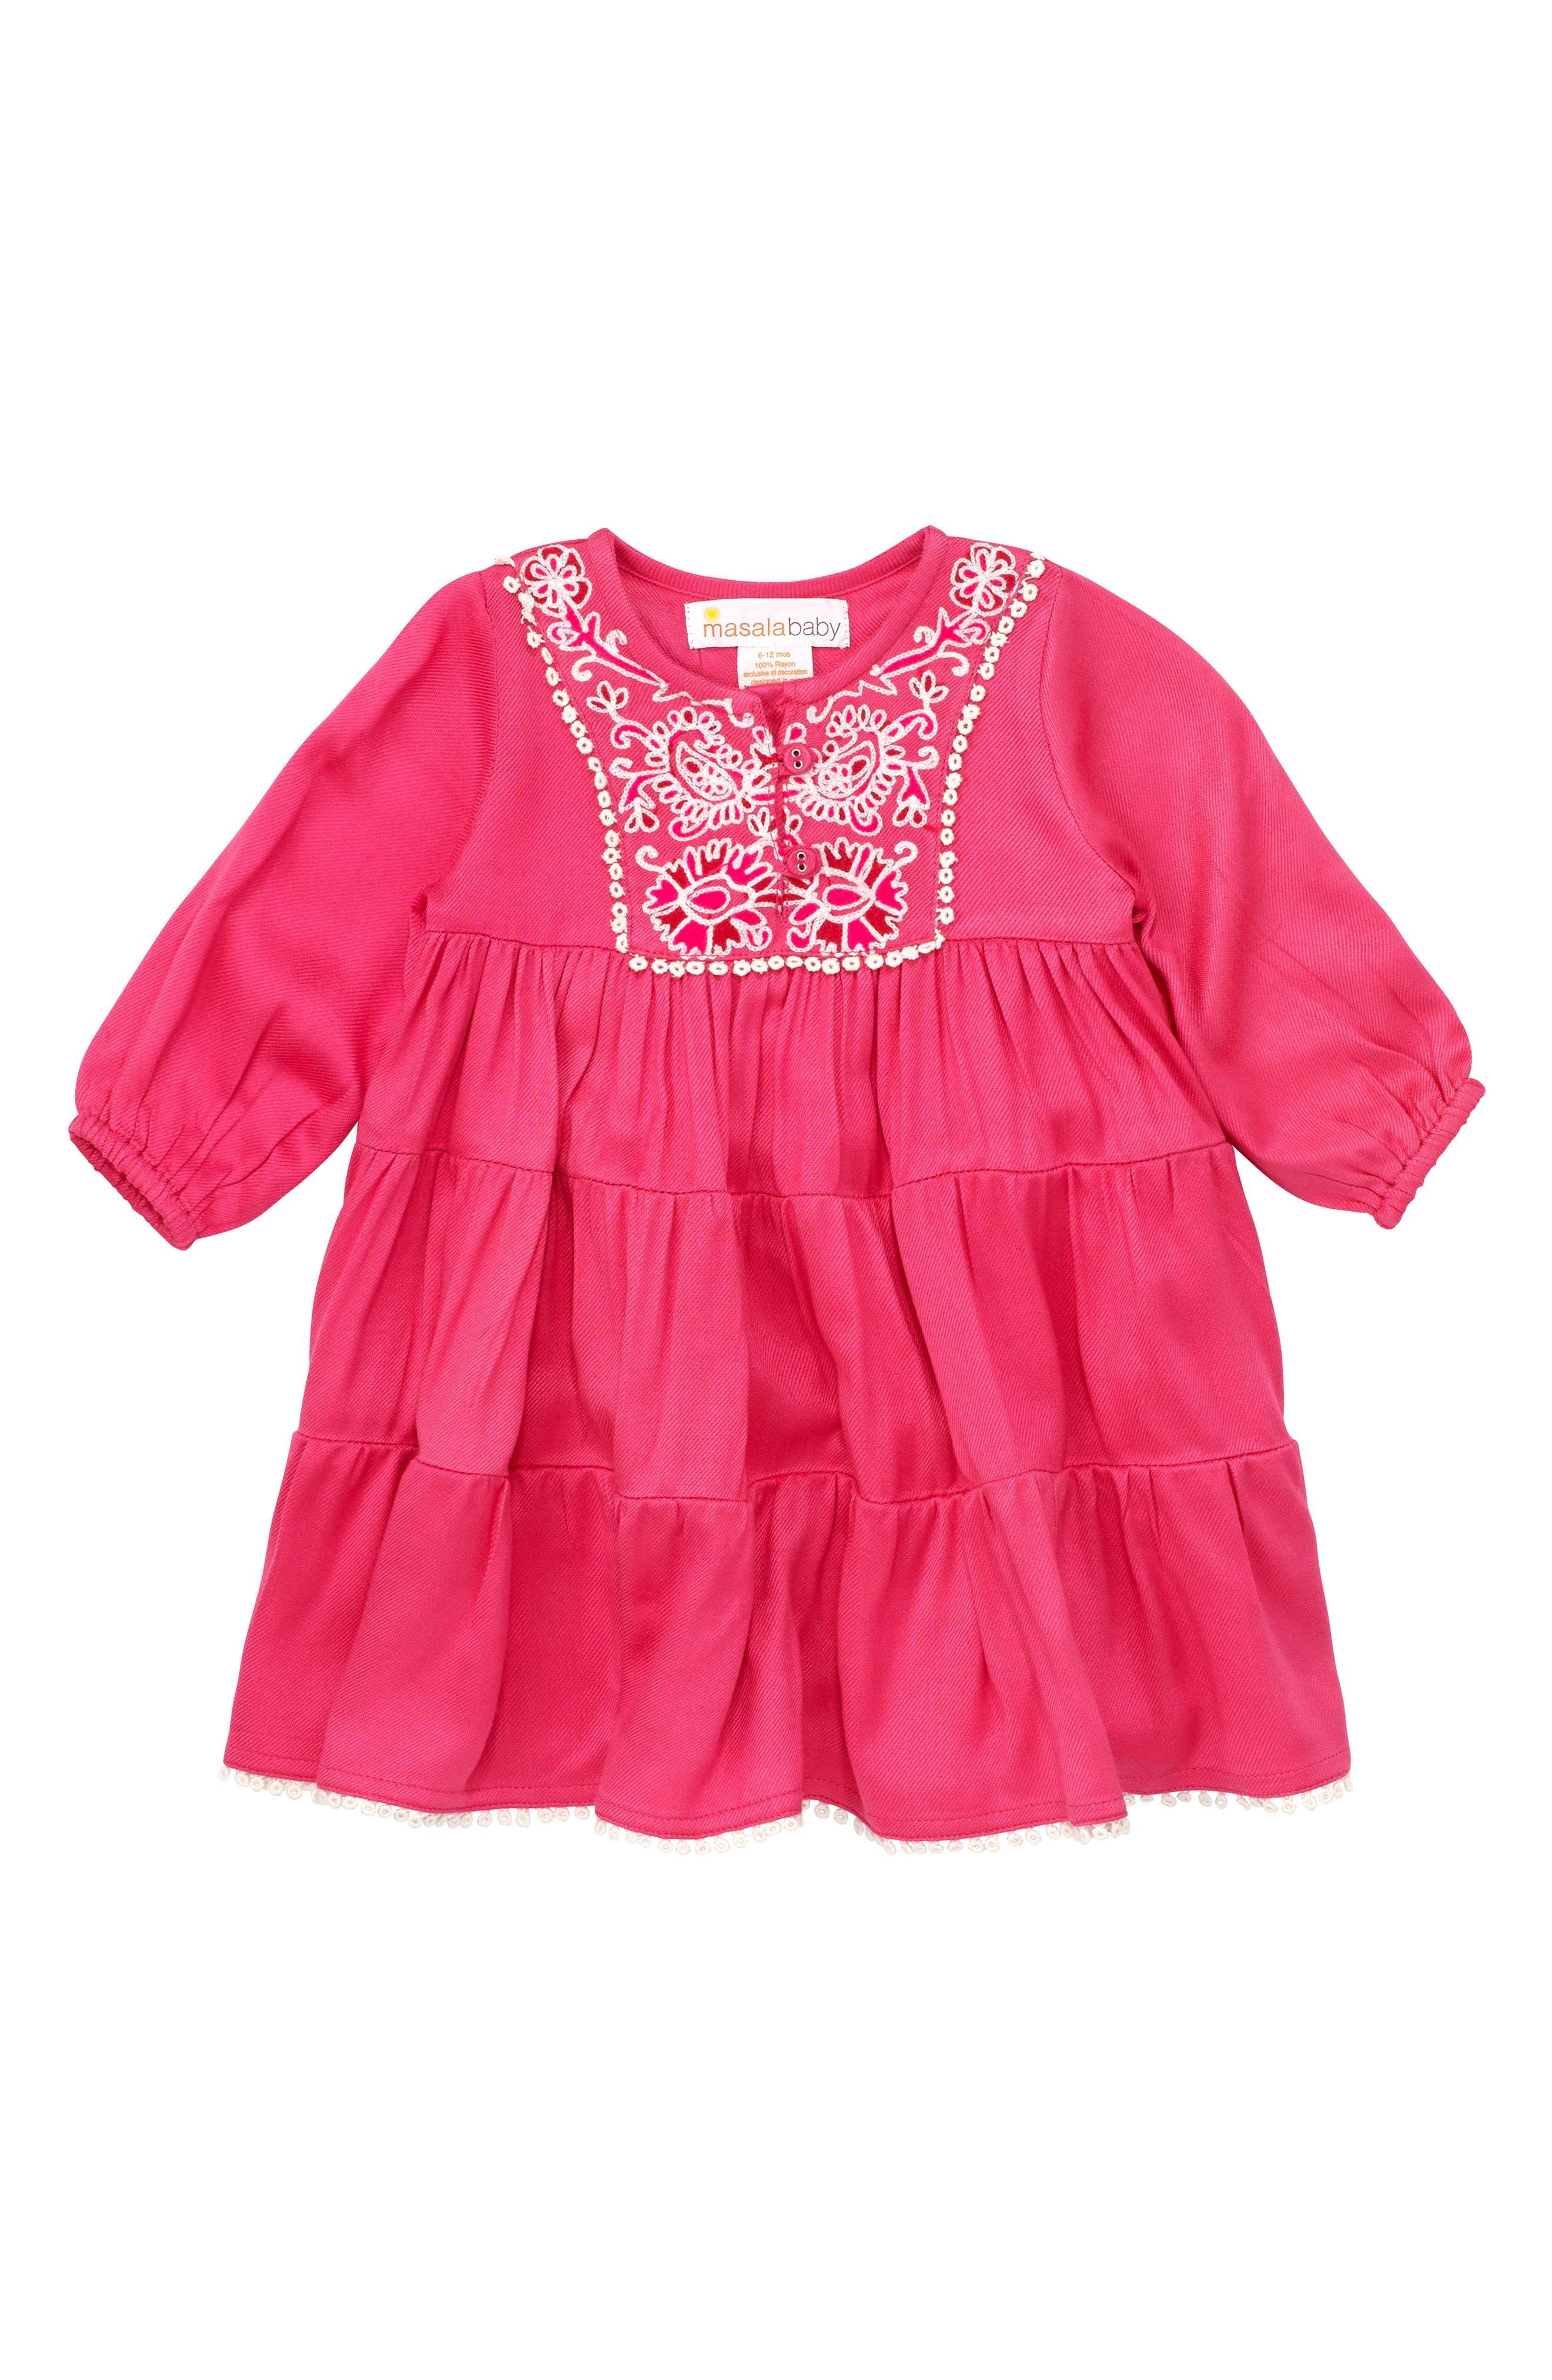 Main Image - Masala Baby Gypsy Rose Dress (Baby Girls)